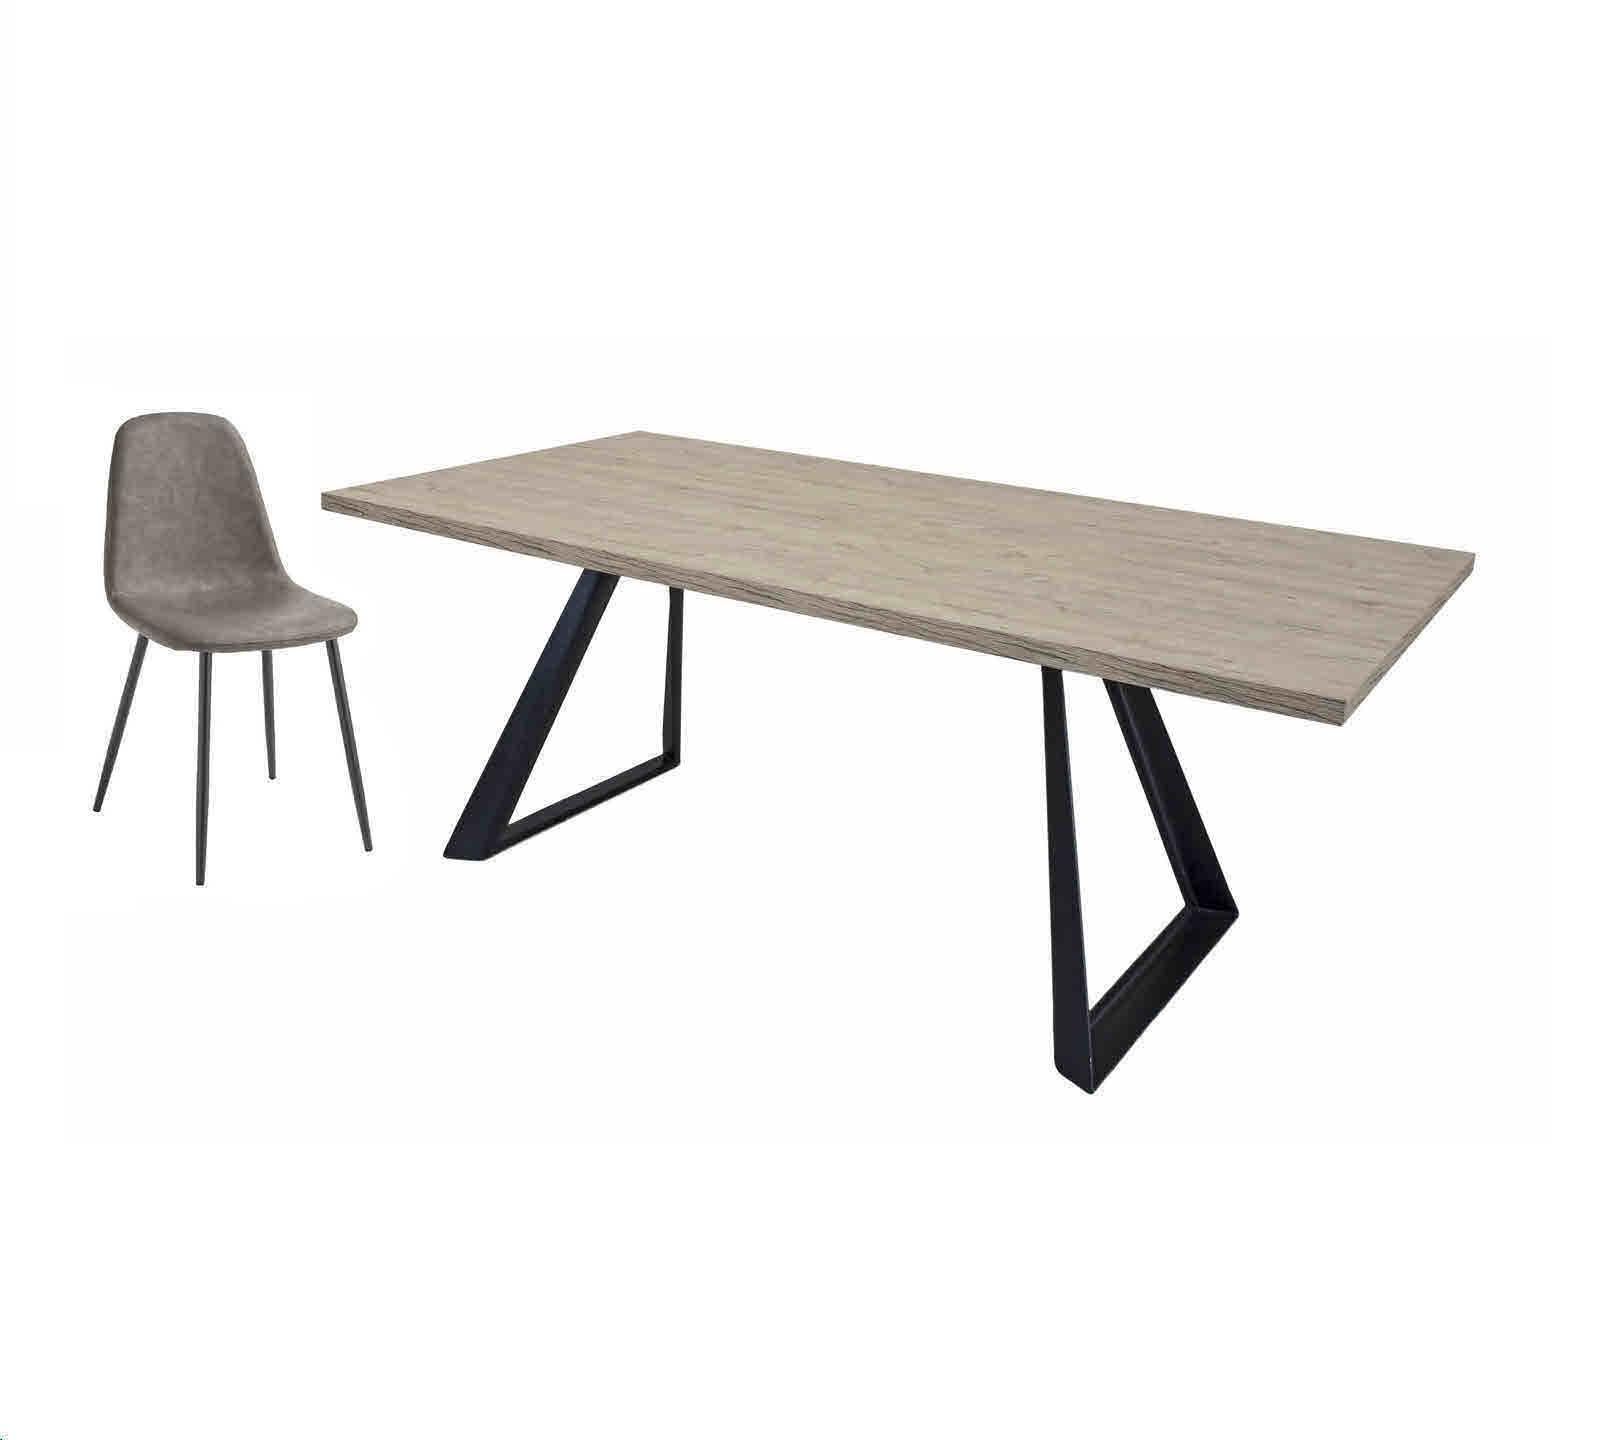 Offerta flash tavolo allungabile 4 sedie scontato 53 for Tavolo allungabile offerta